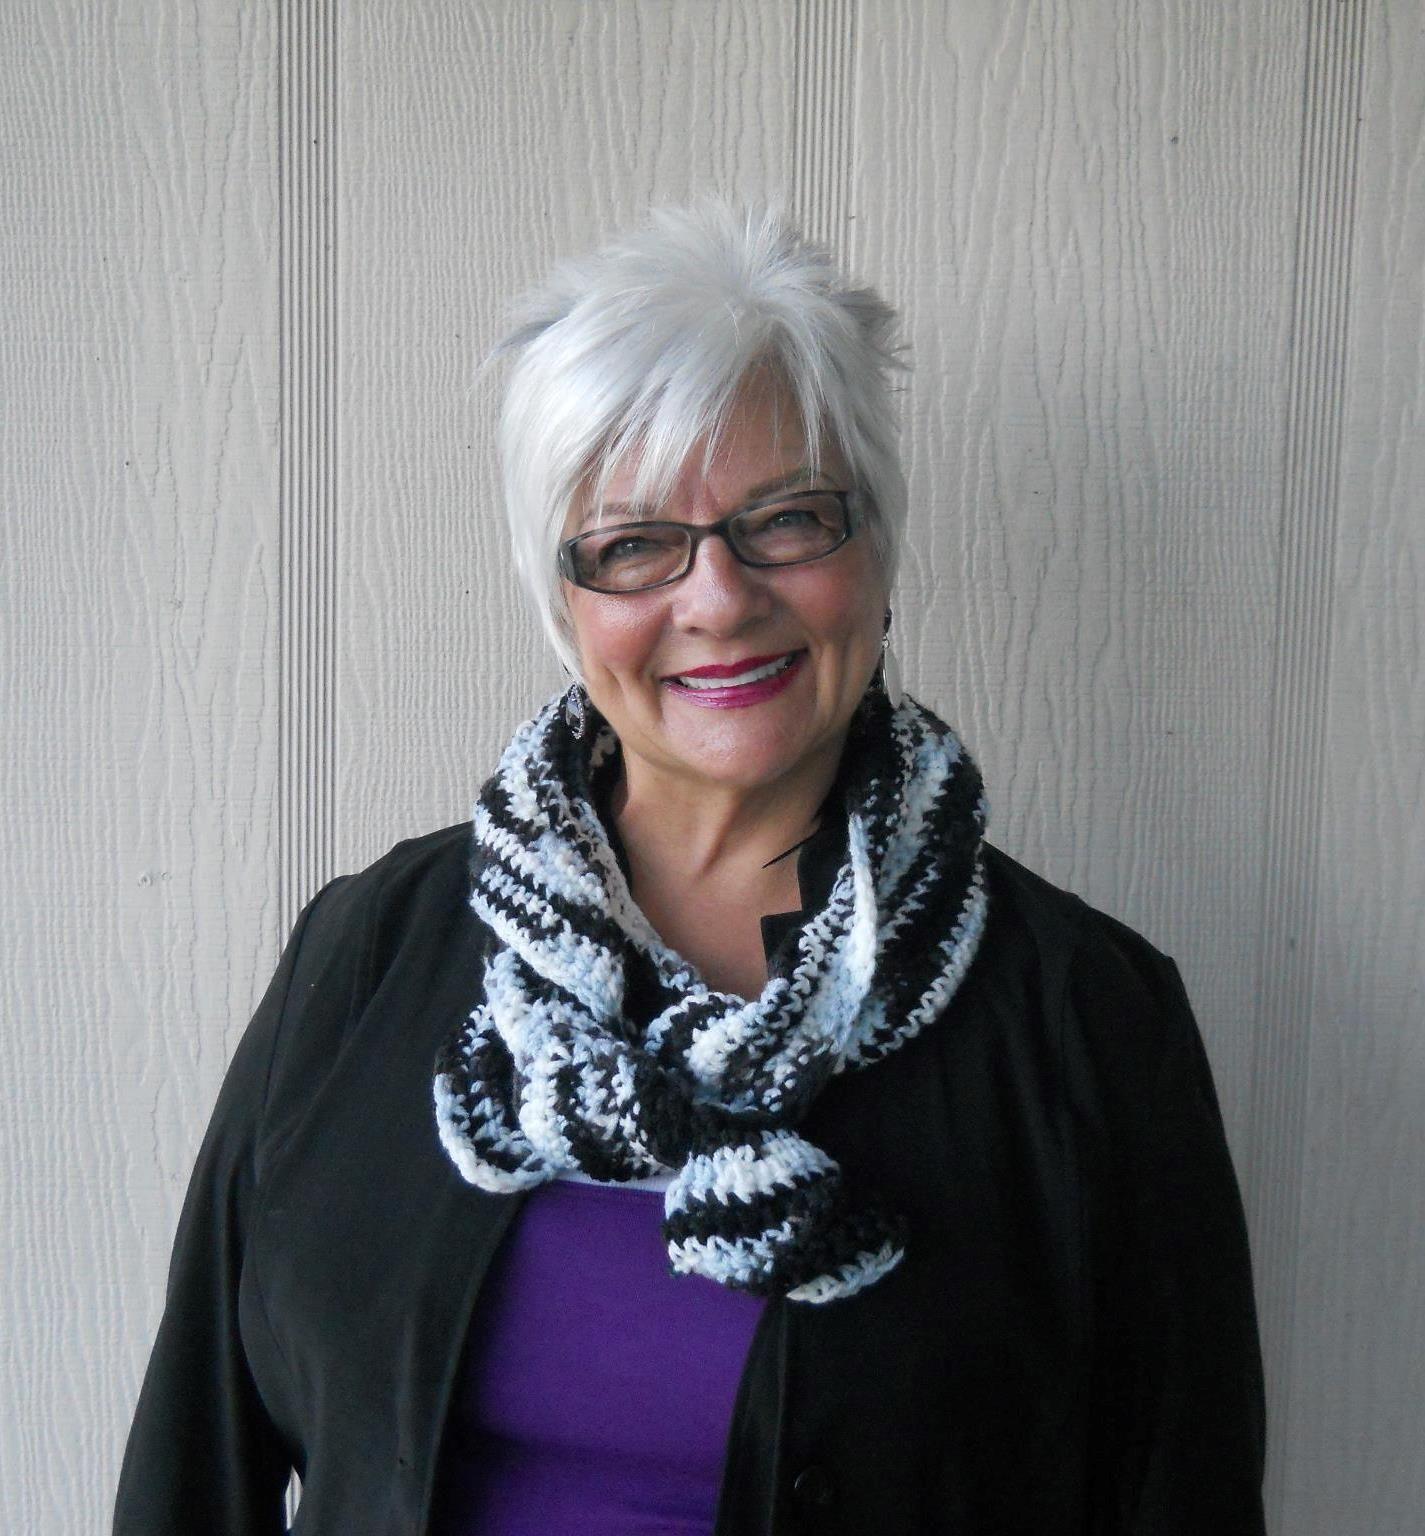 white hair...lovely | Grey hair and glasses, Short thin hair